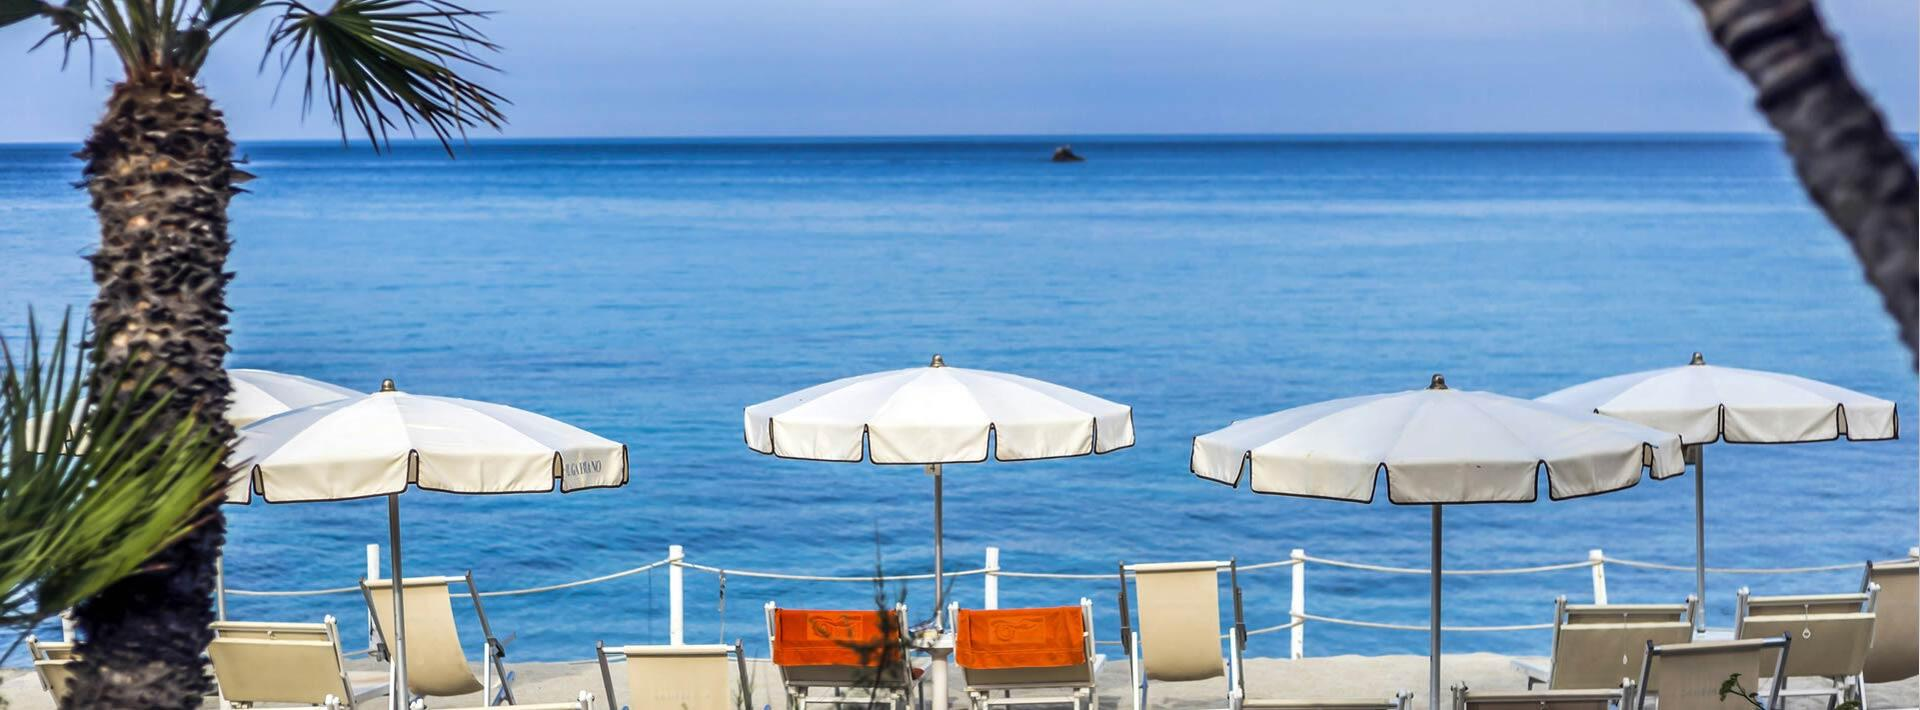 villaggioilgabbiano en seaside-holiday-calabria 010